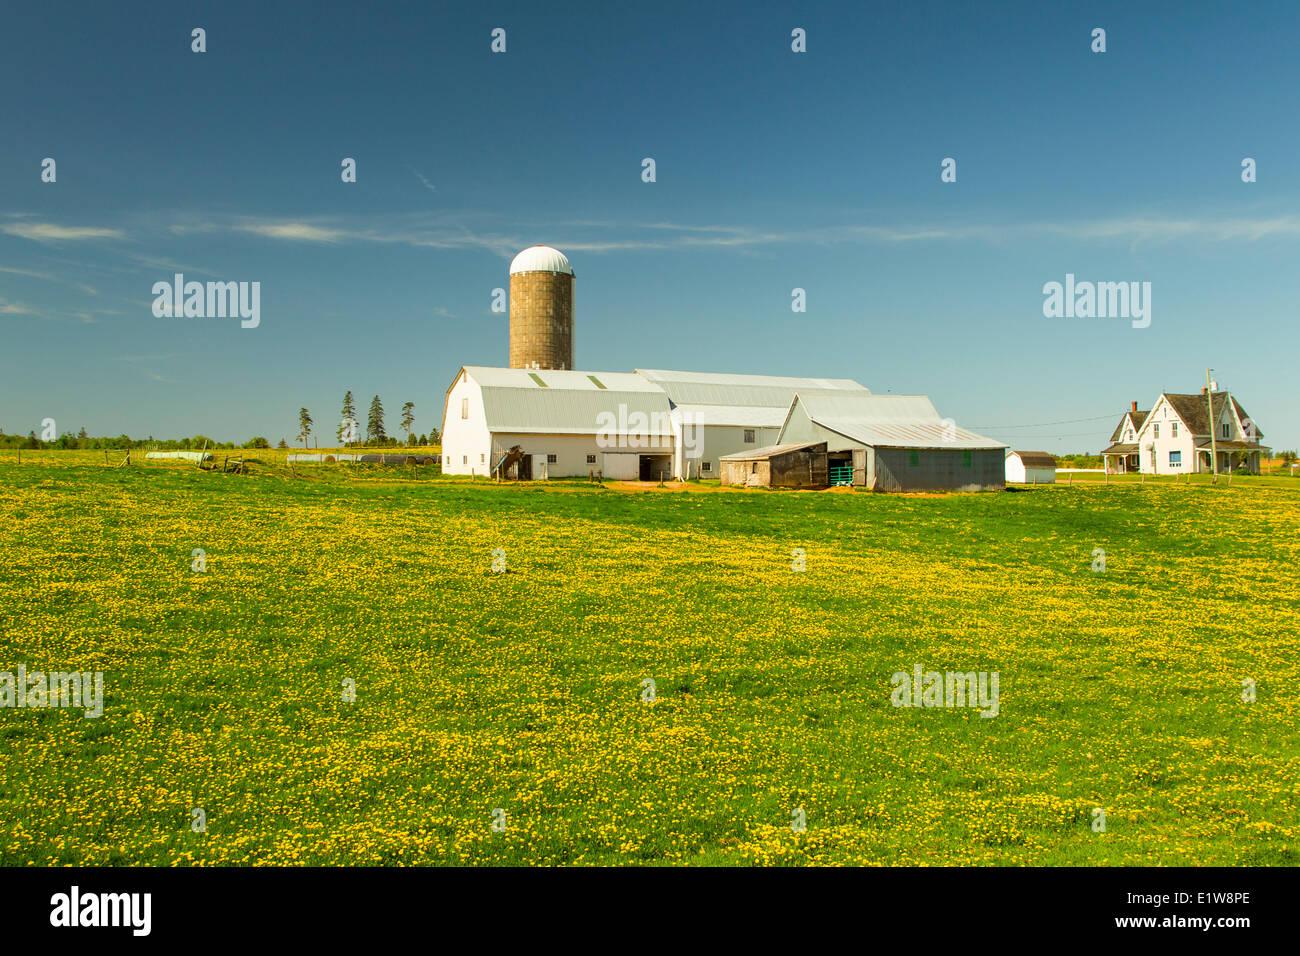 Farm, Springfield, Prince Edward Island, Canada - Stock Image